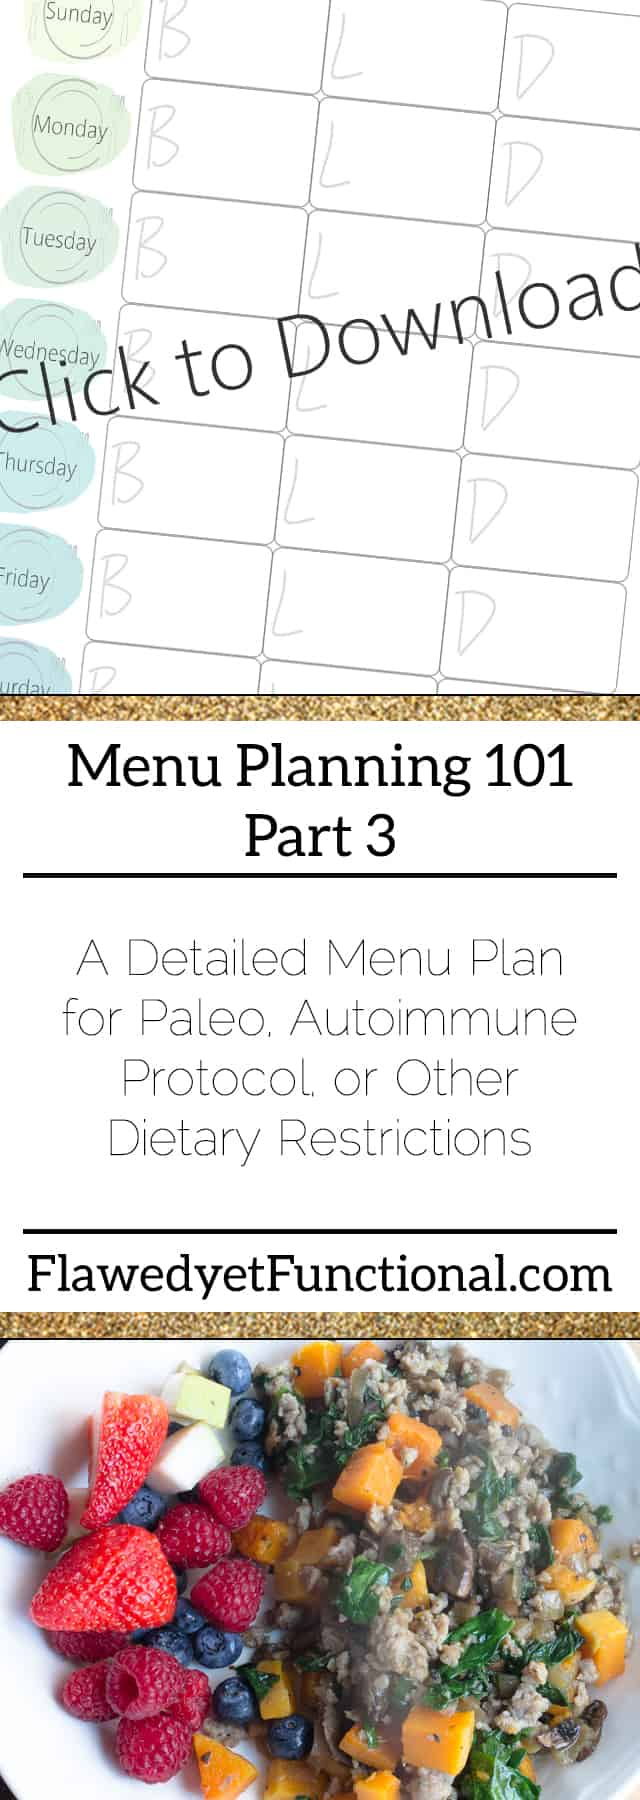 Menu Planning EveryMeal